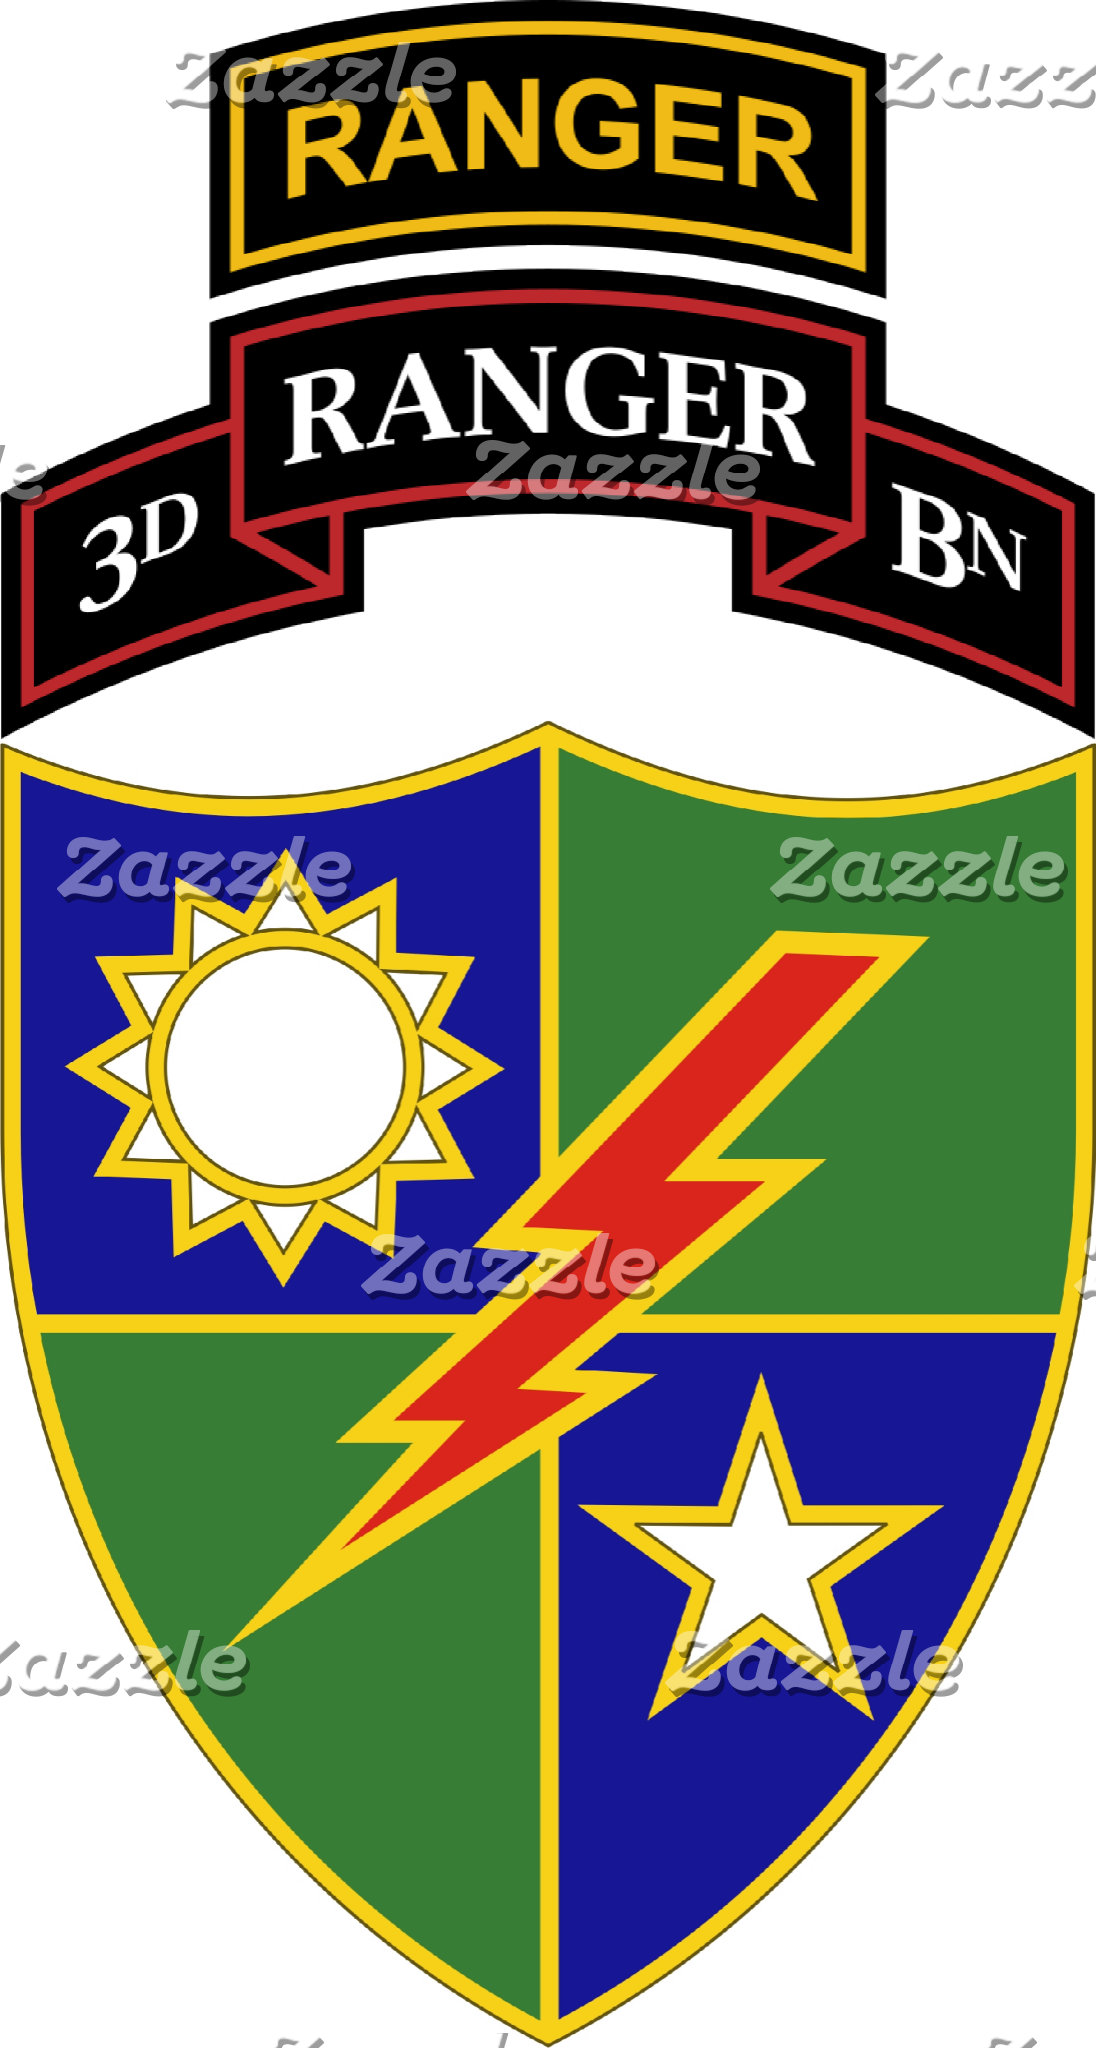 3rd Battalion - 75th Ranger Regiment w/ Ranger Tab